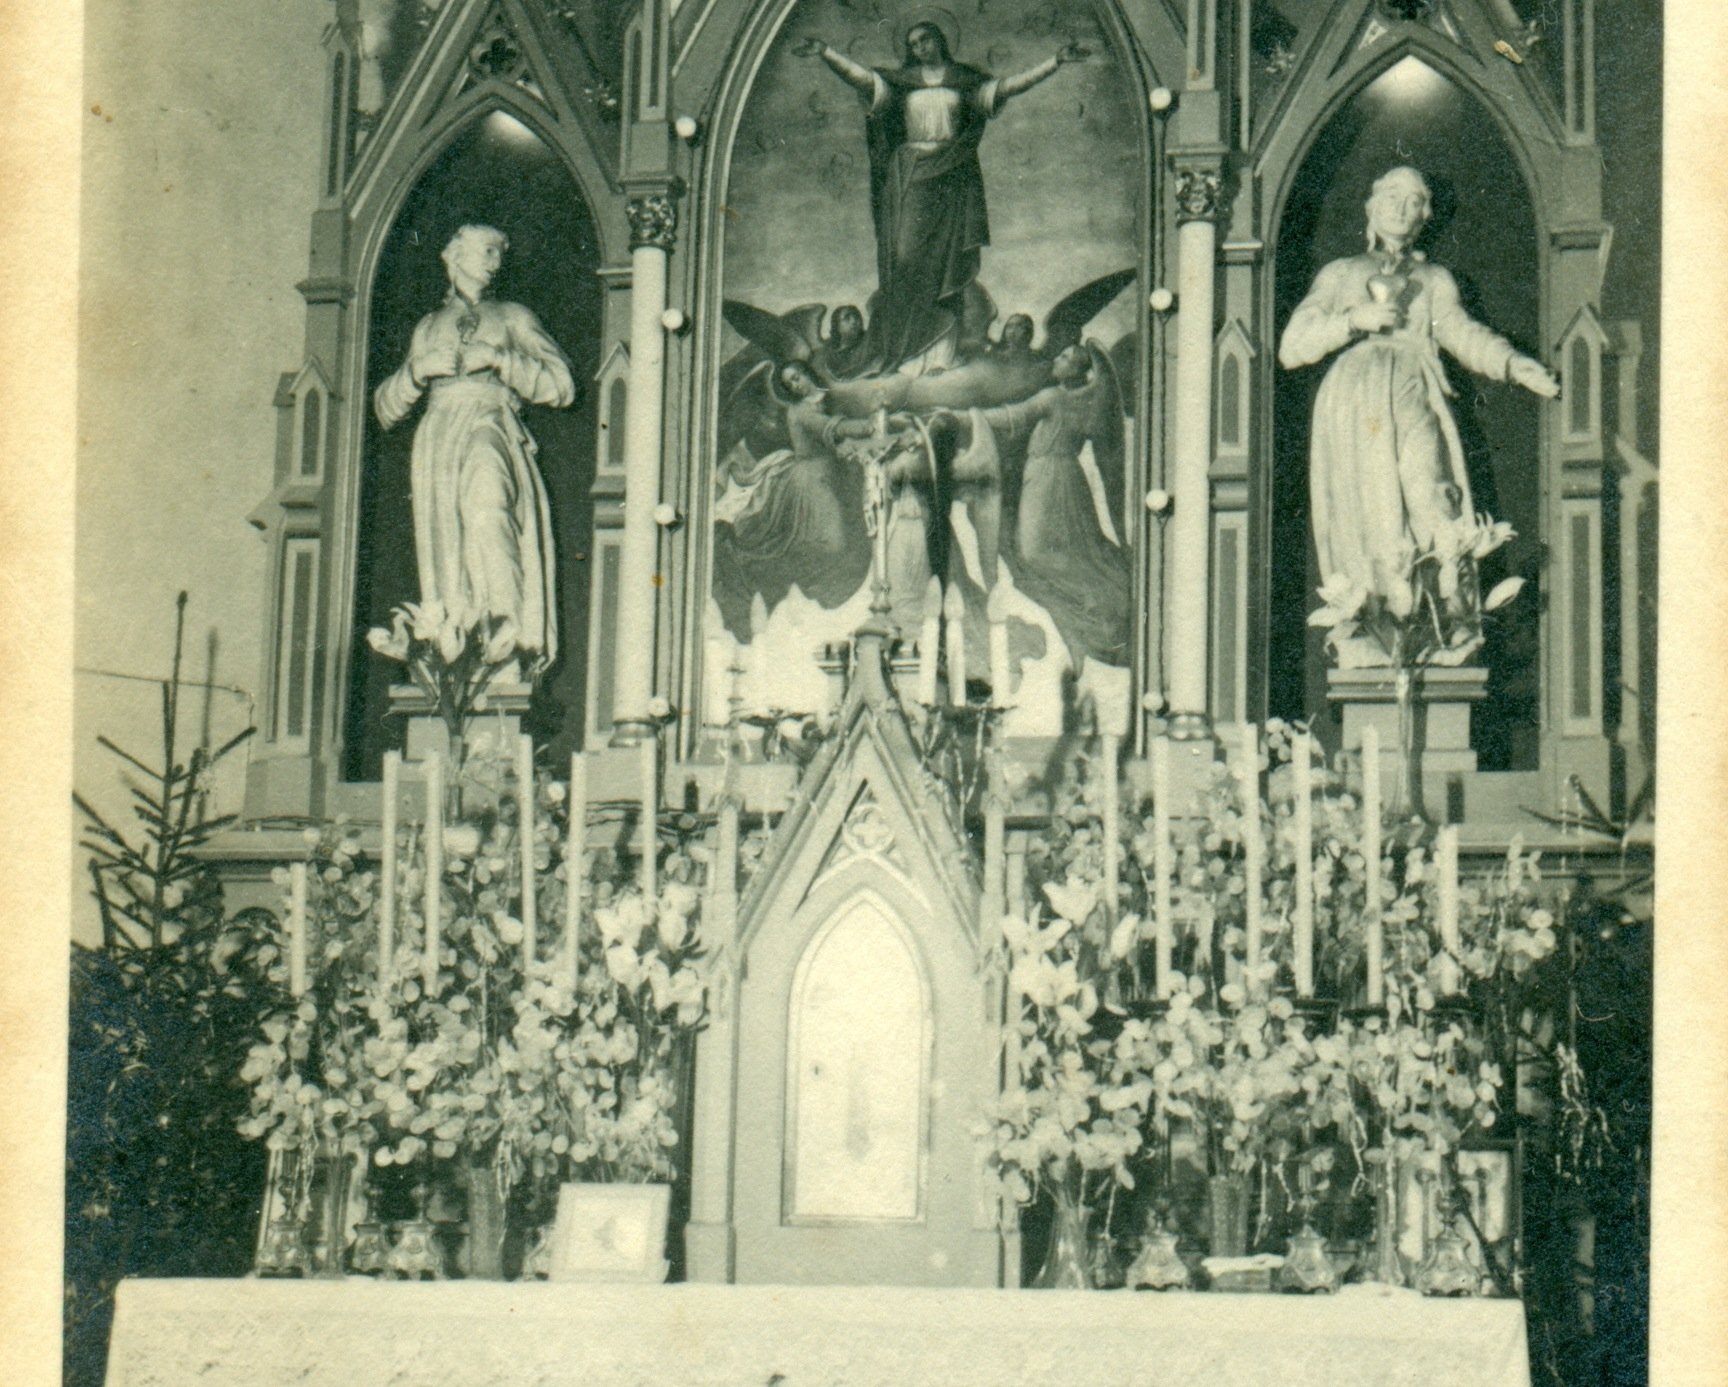 sequenza-foto-gennaio-1950-1 copia